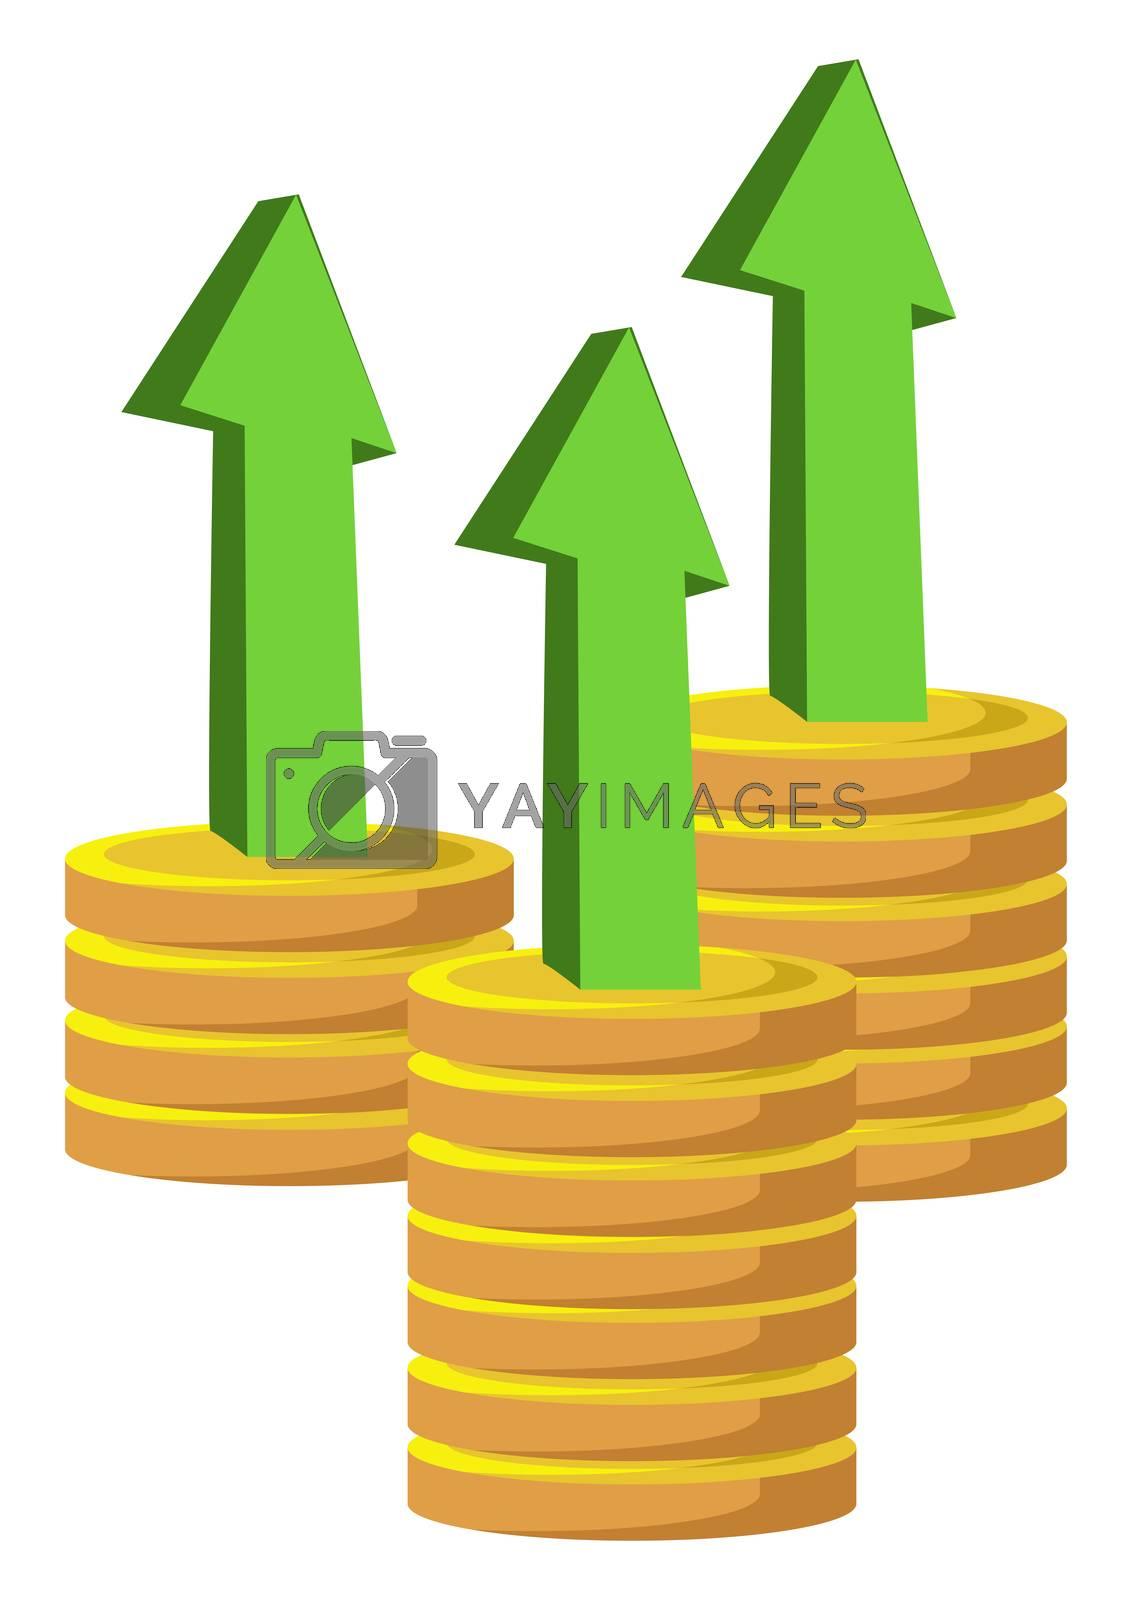 Economy growth, illustration, vector on white background